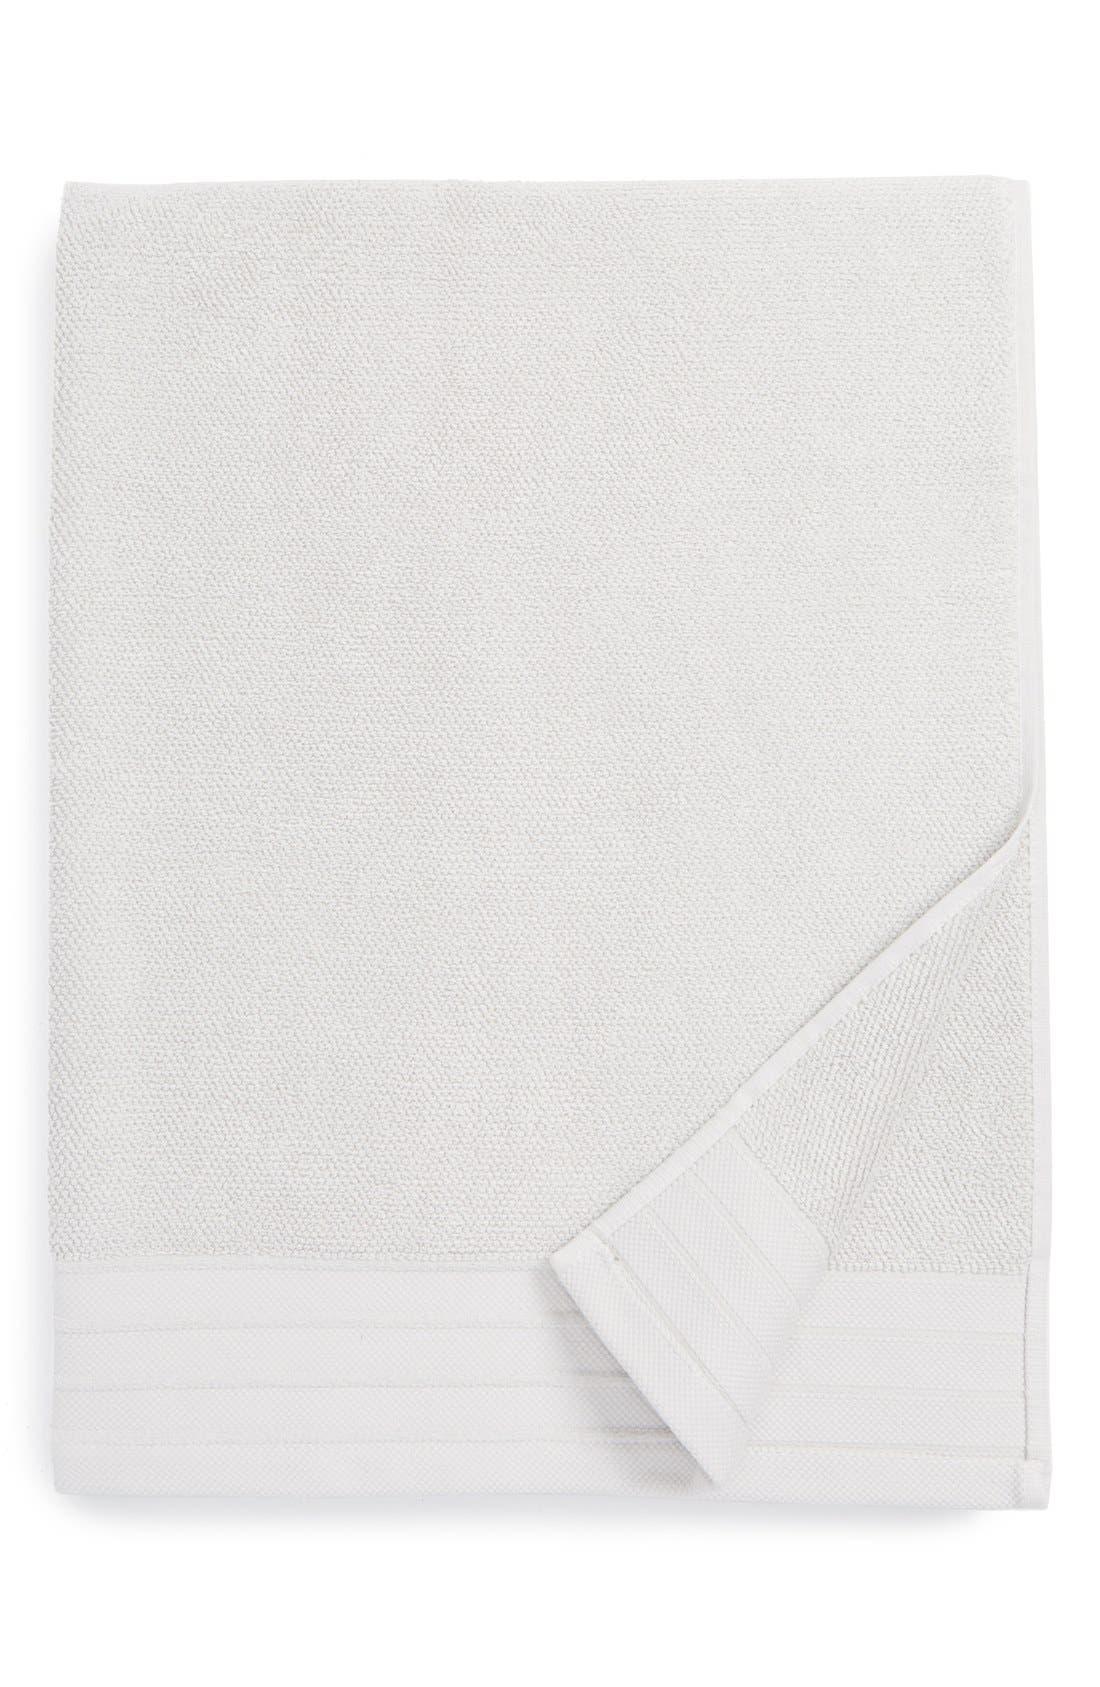 UGG® Classic Luxe Bath Towel